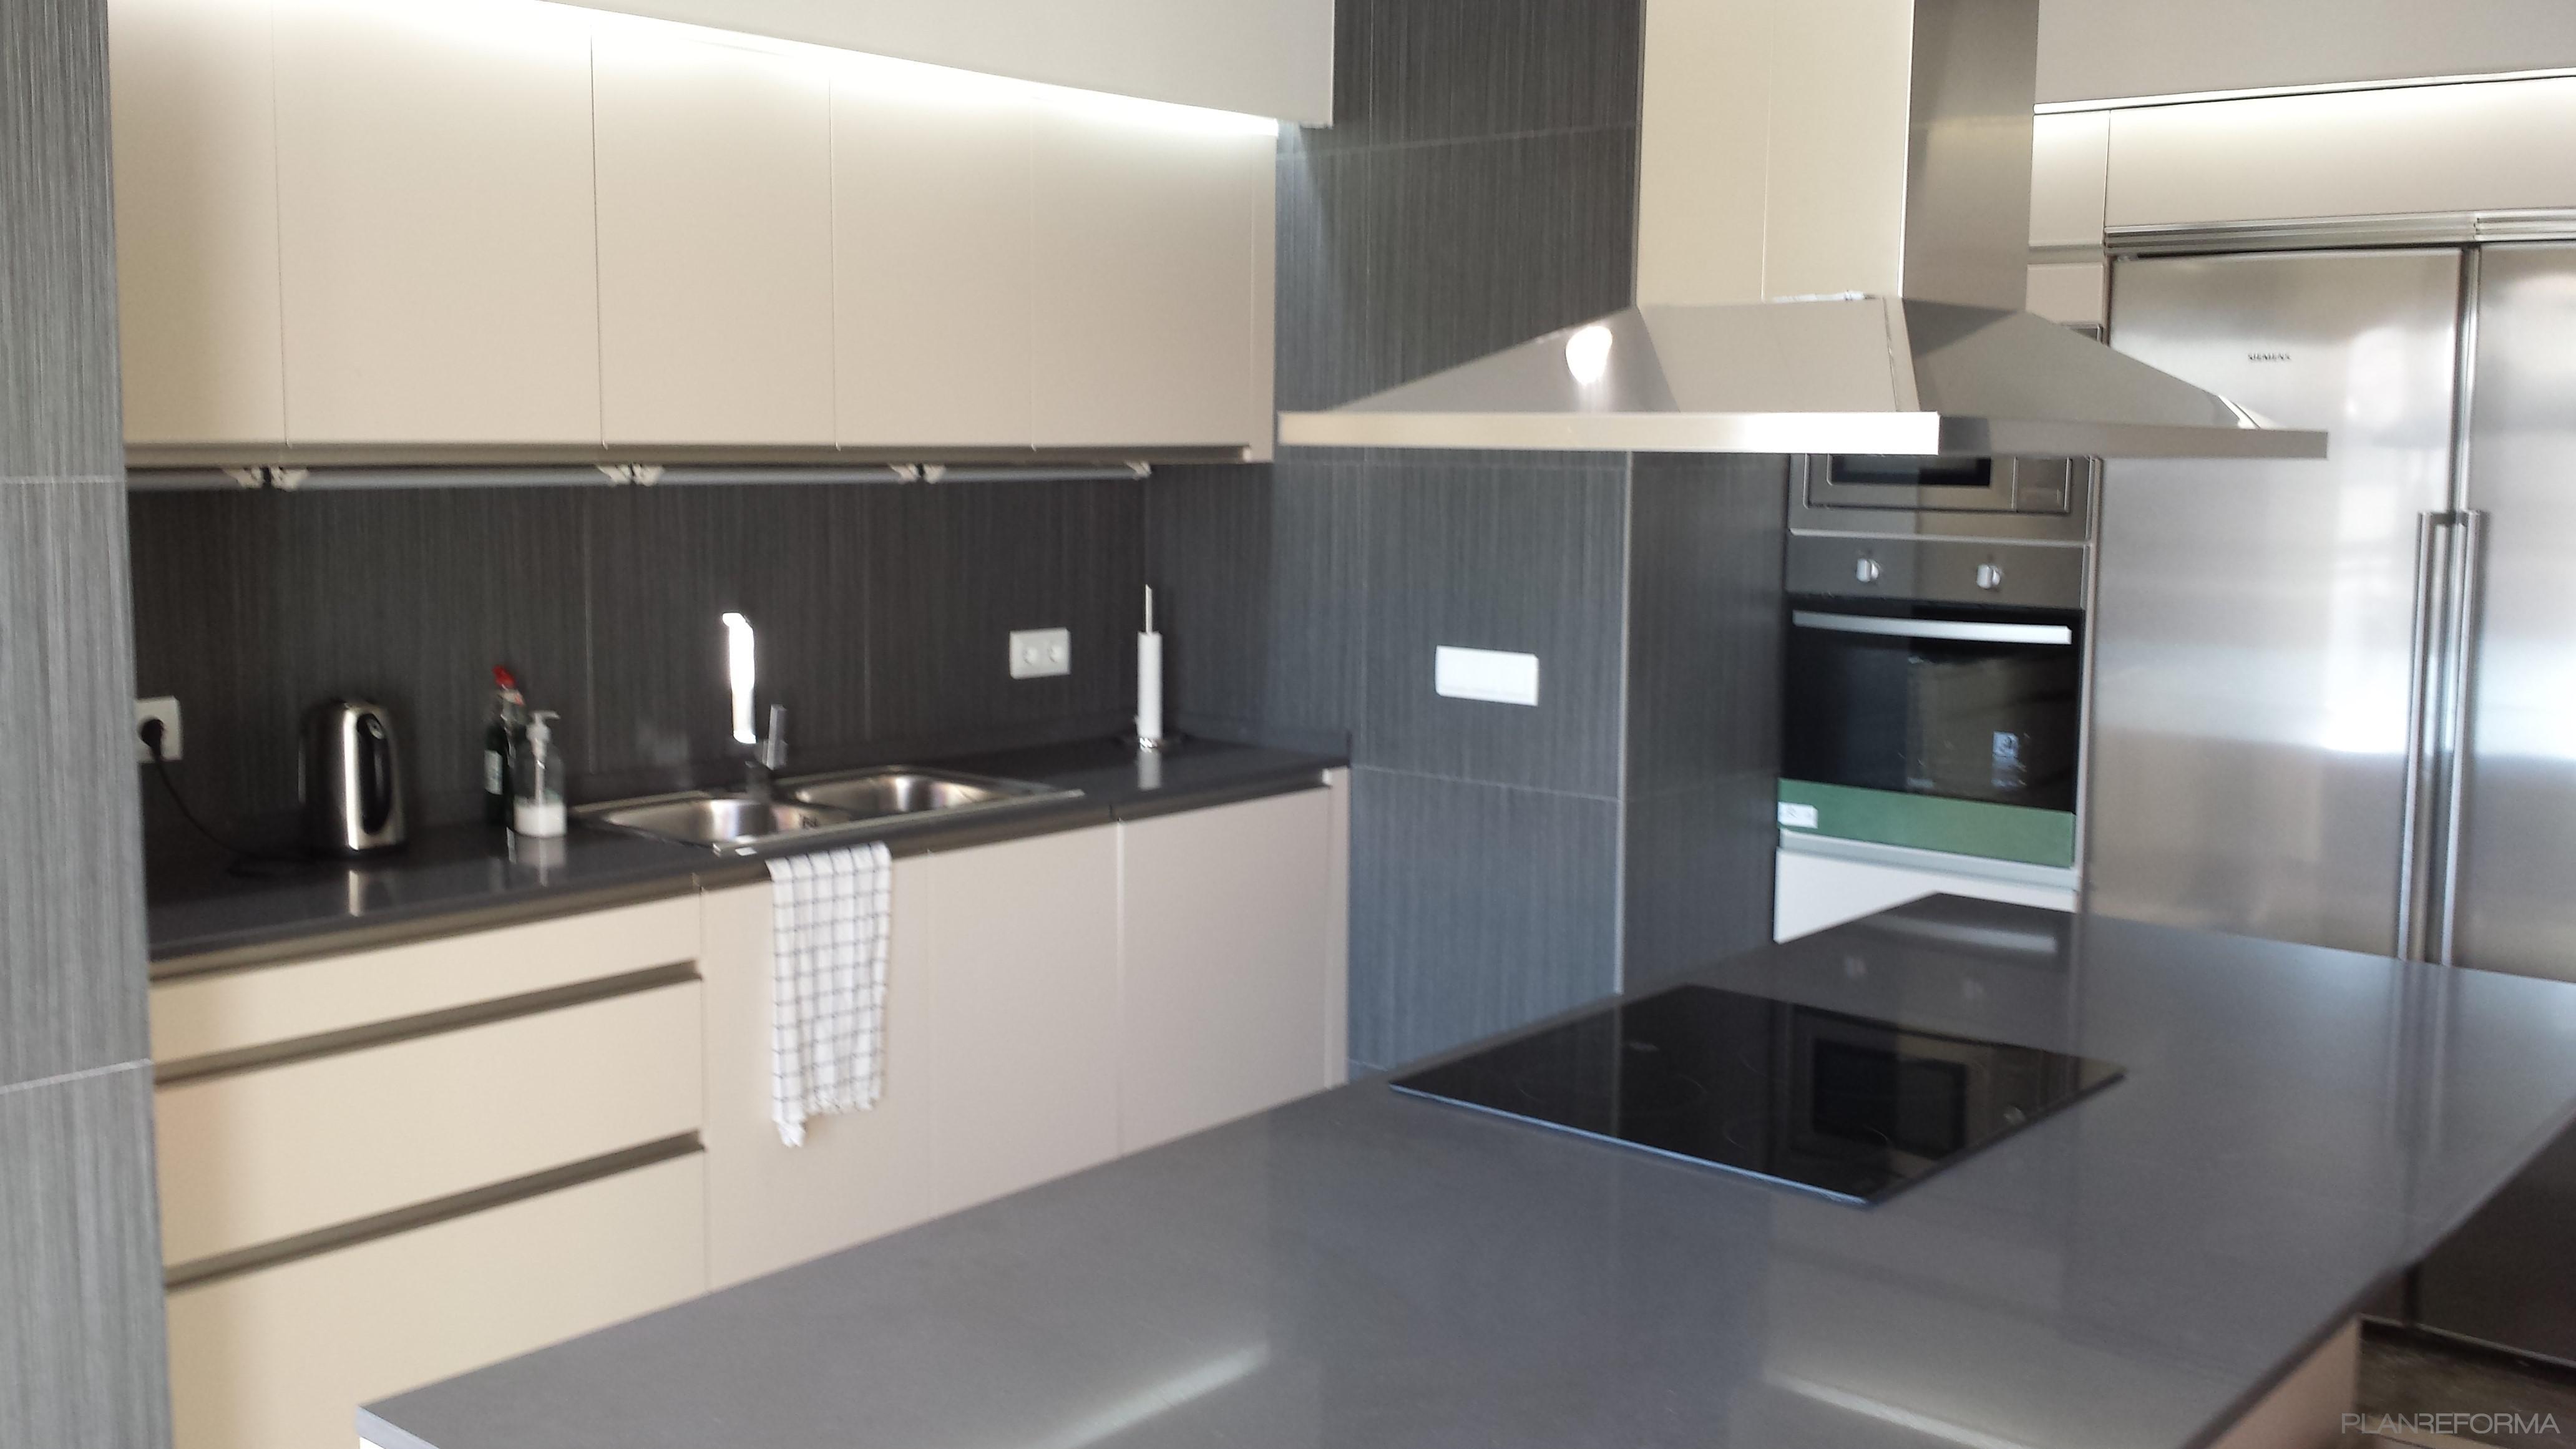 Cocina style moderno color beige gris plateado - Cocinas con estilo moderno ...